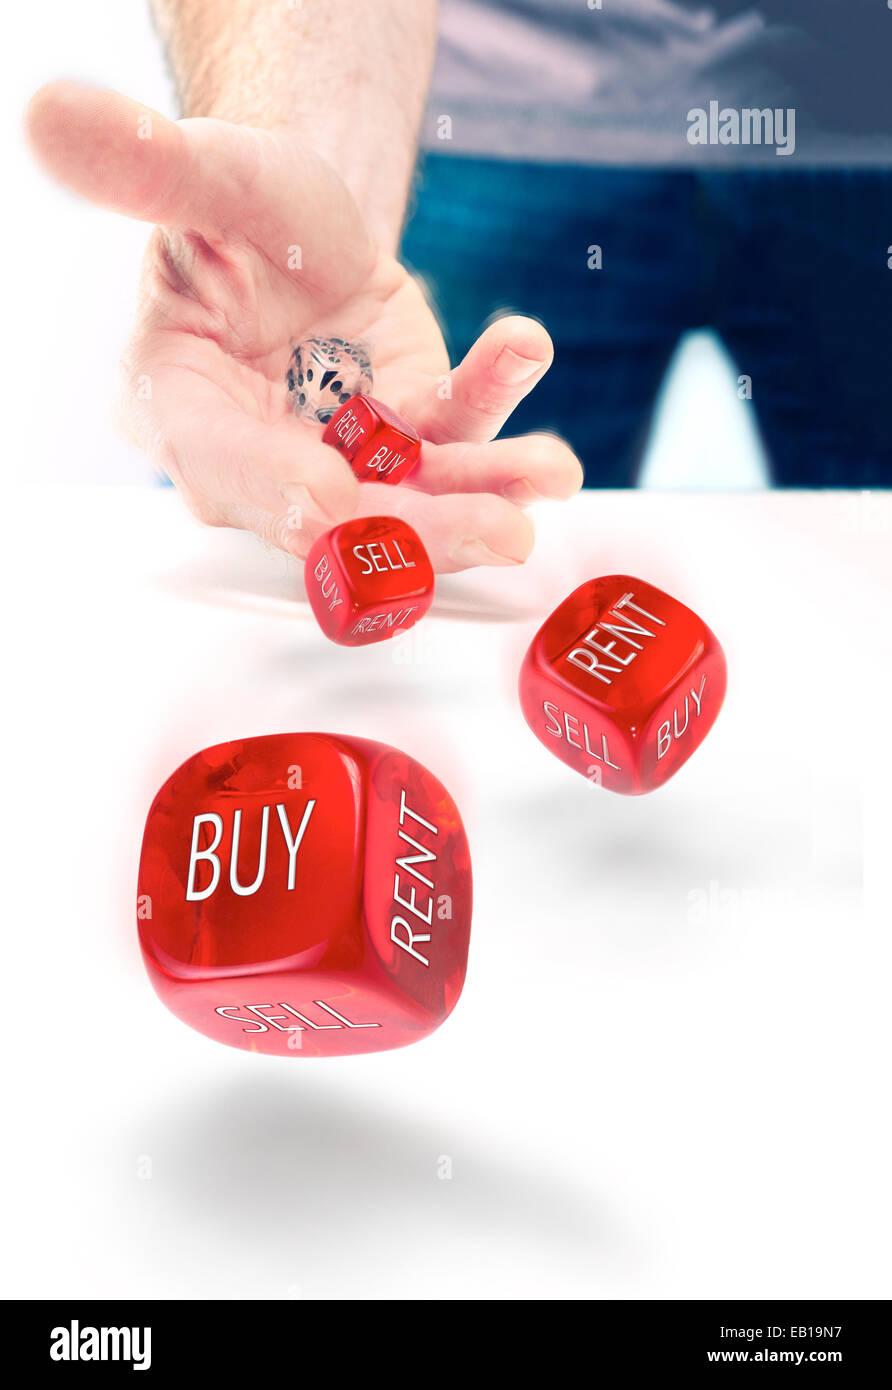 Buy vs Rent indecision, risk concept. - Stock Image